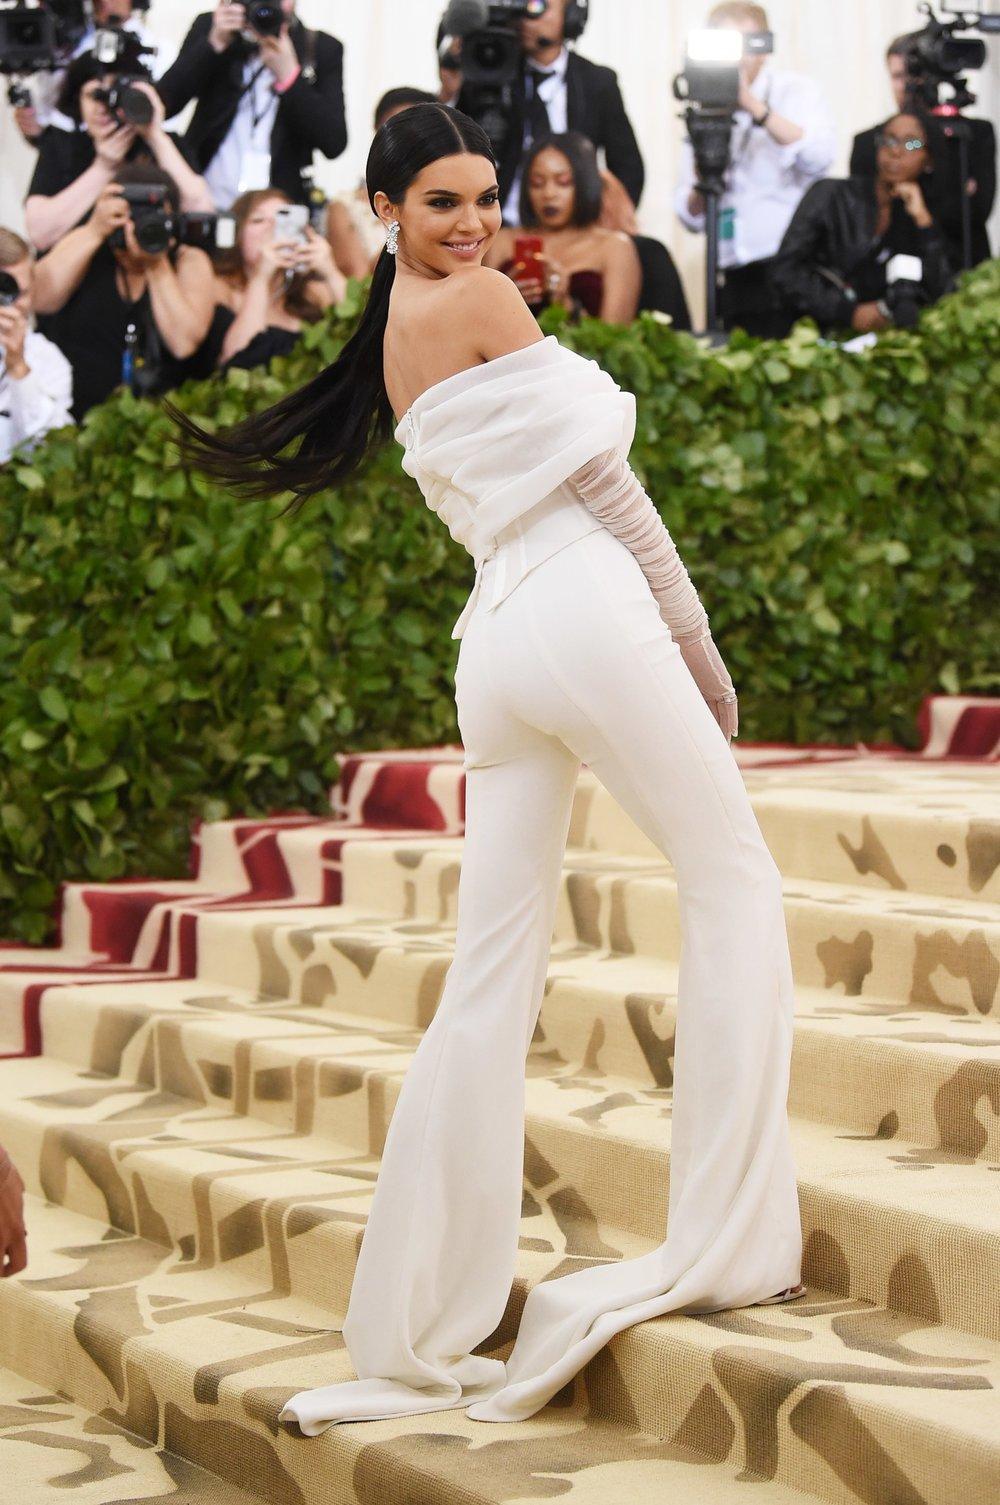 Kendall Jenner | Image via Harpers Bazaar